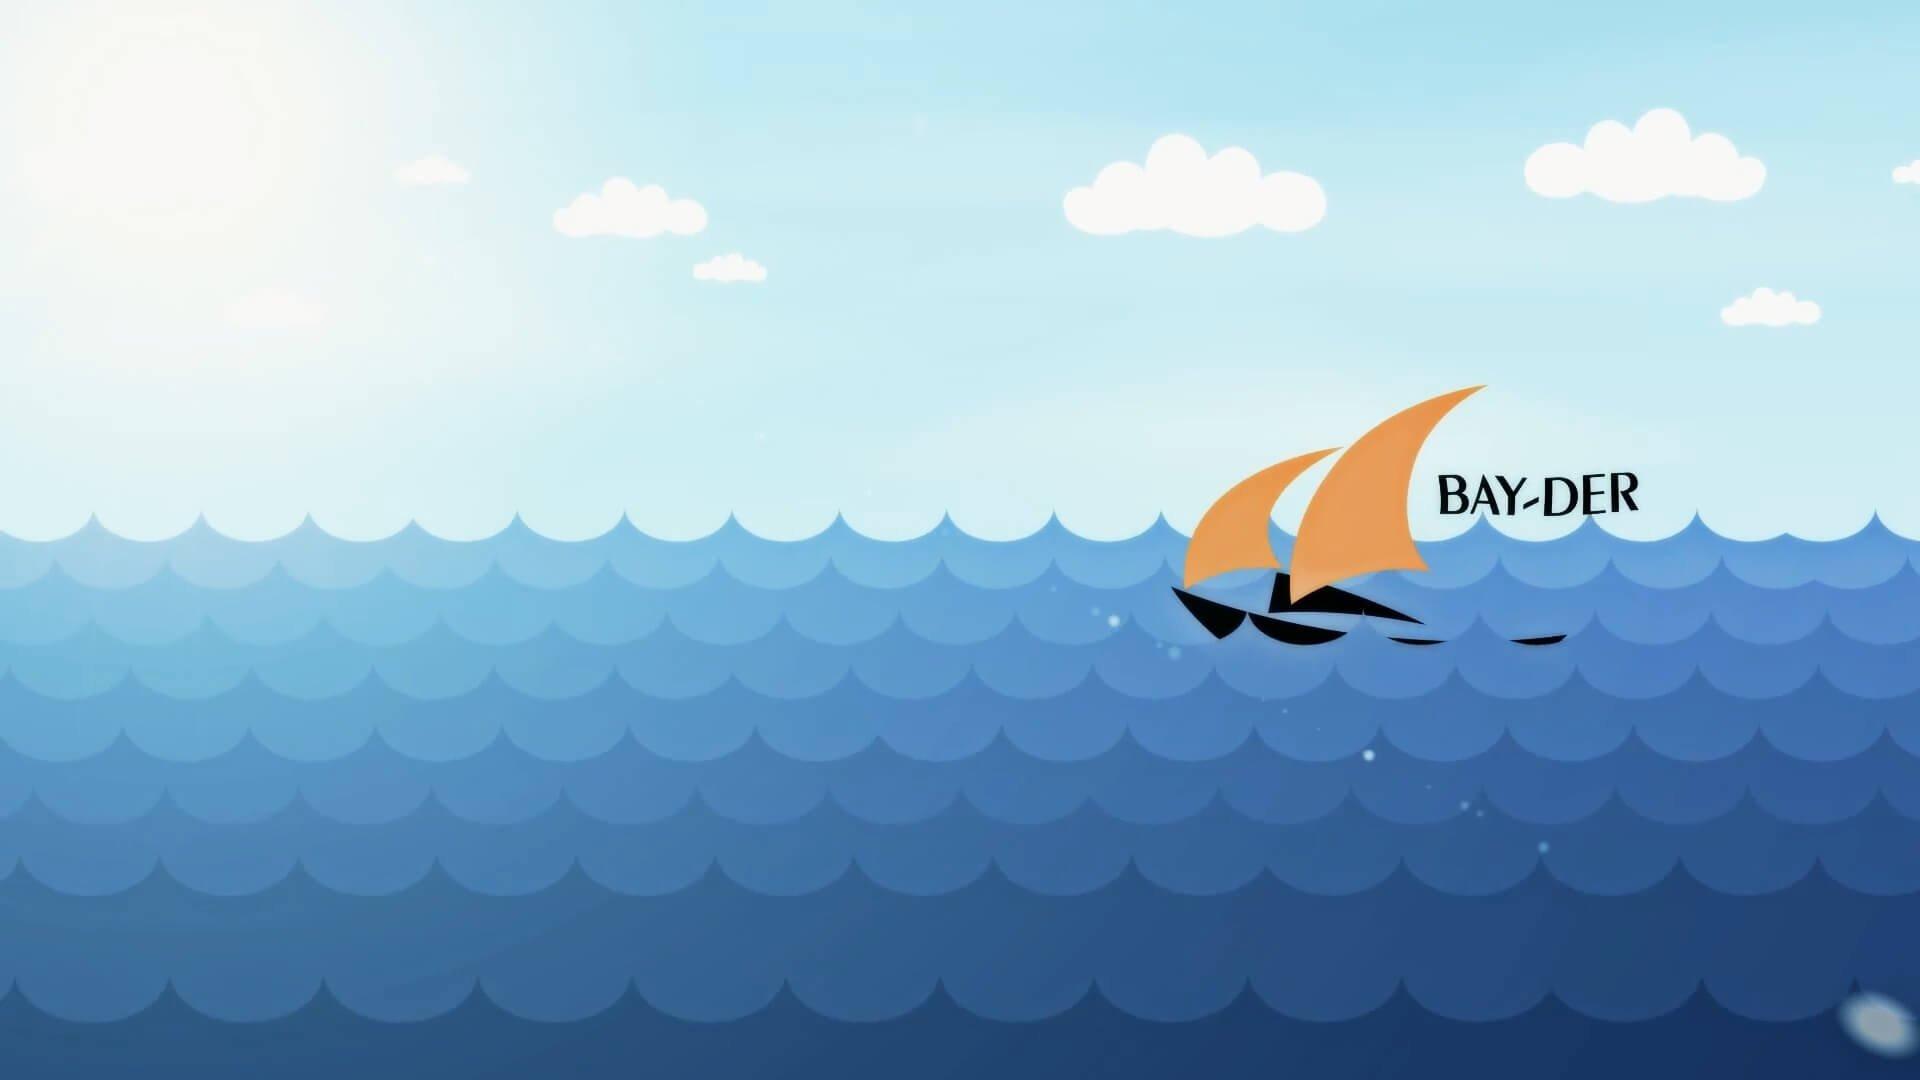 Bayder Logo Animasyon 3 1920x1080 - Bayder Logo Animasyonu